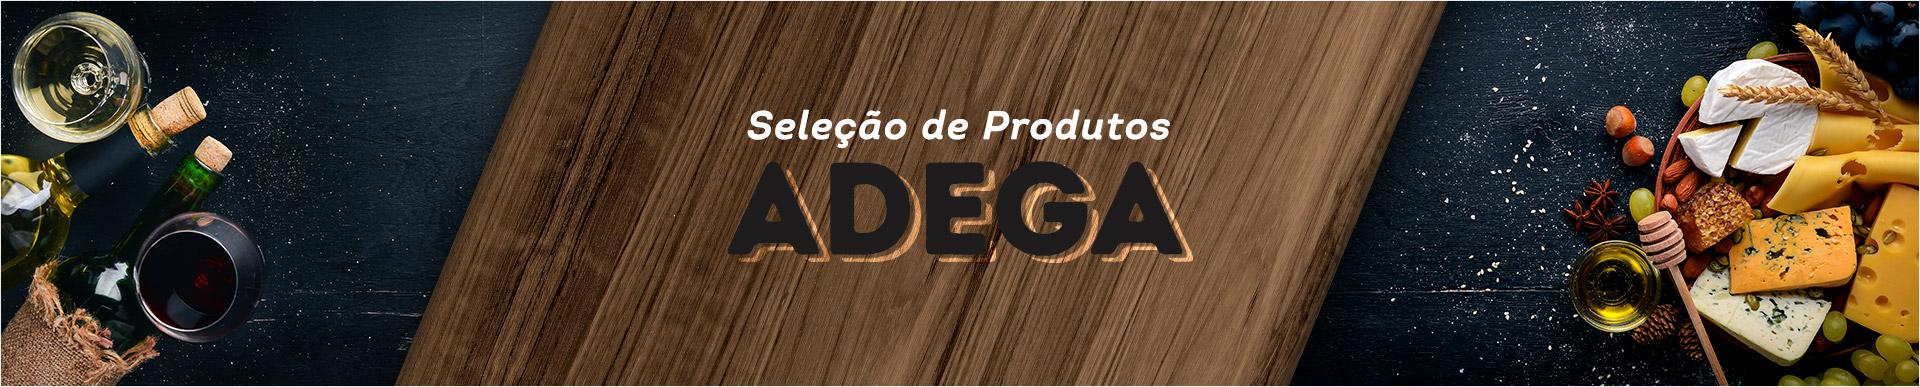 Banner Quinta Adega